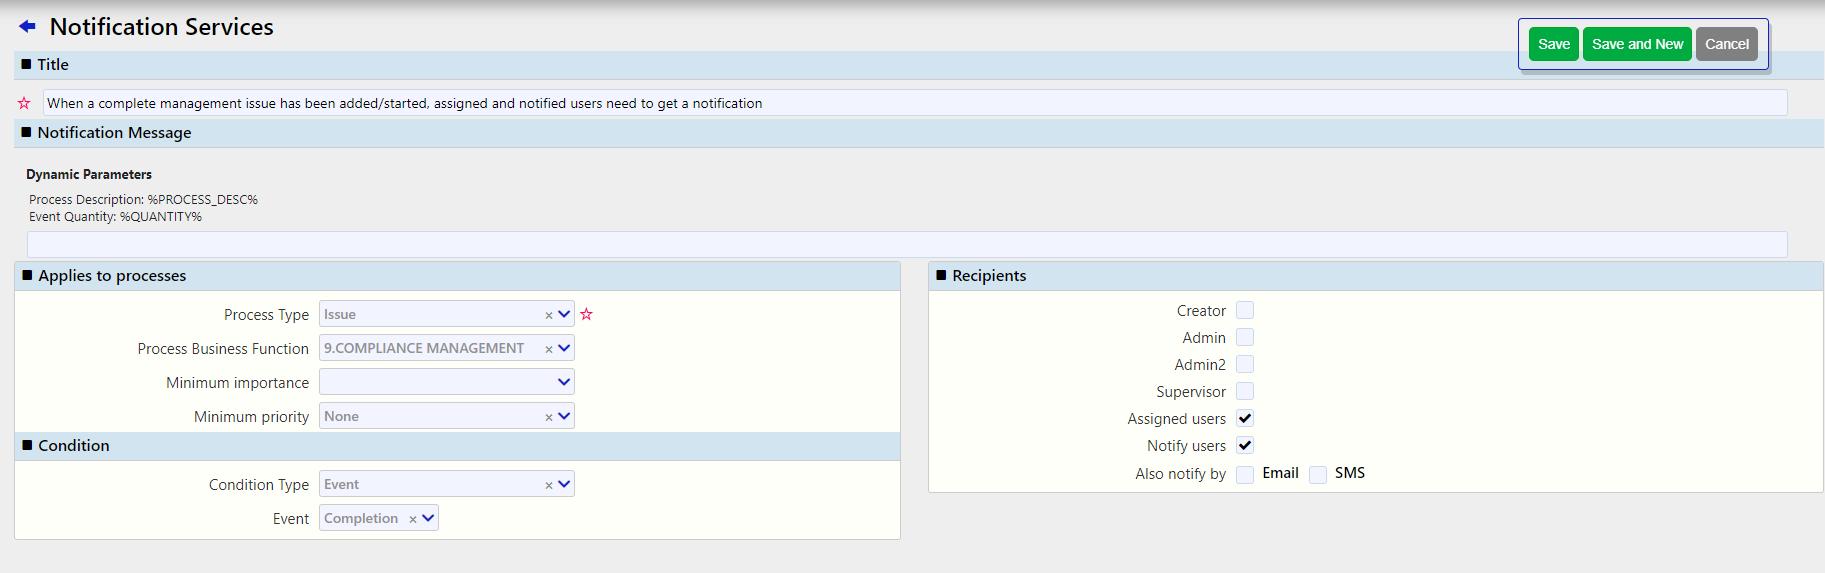 notifications services/ Comidor Digital Automation Platform